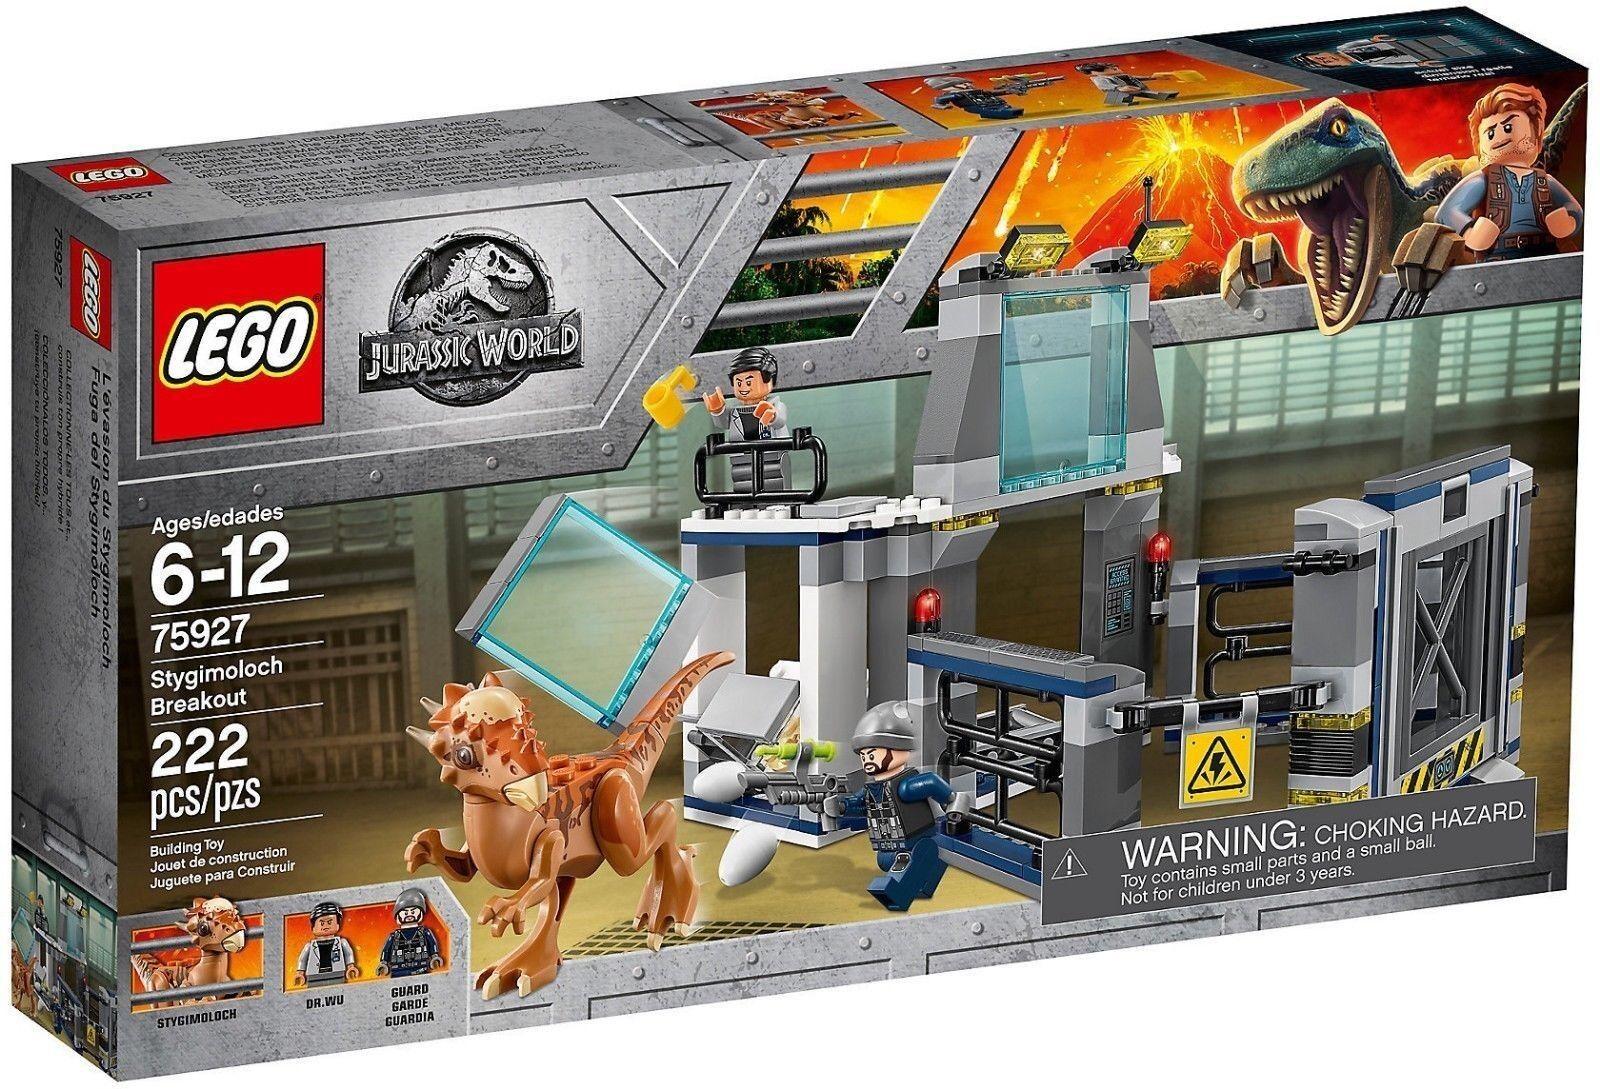 LEGO JURASSIC WORLD L'EVASIONE DELLO STYGIMOLOCH - LEGO 75927